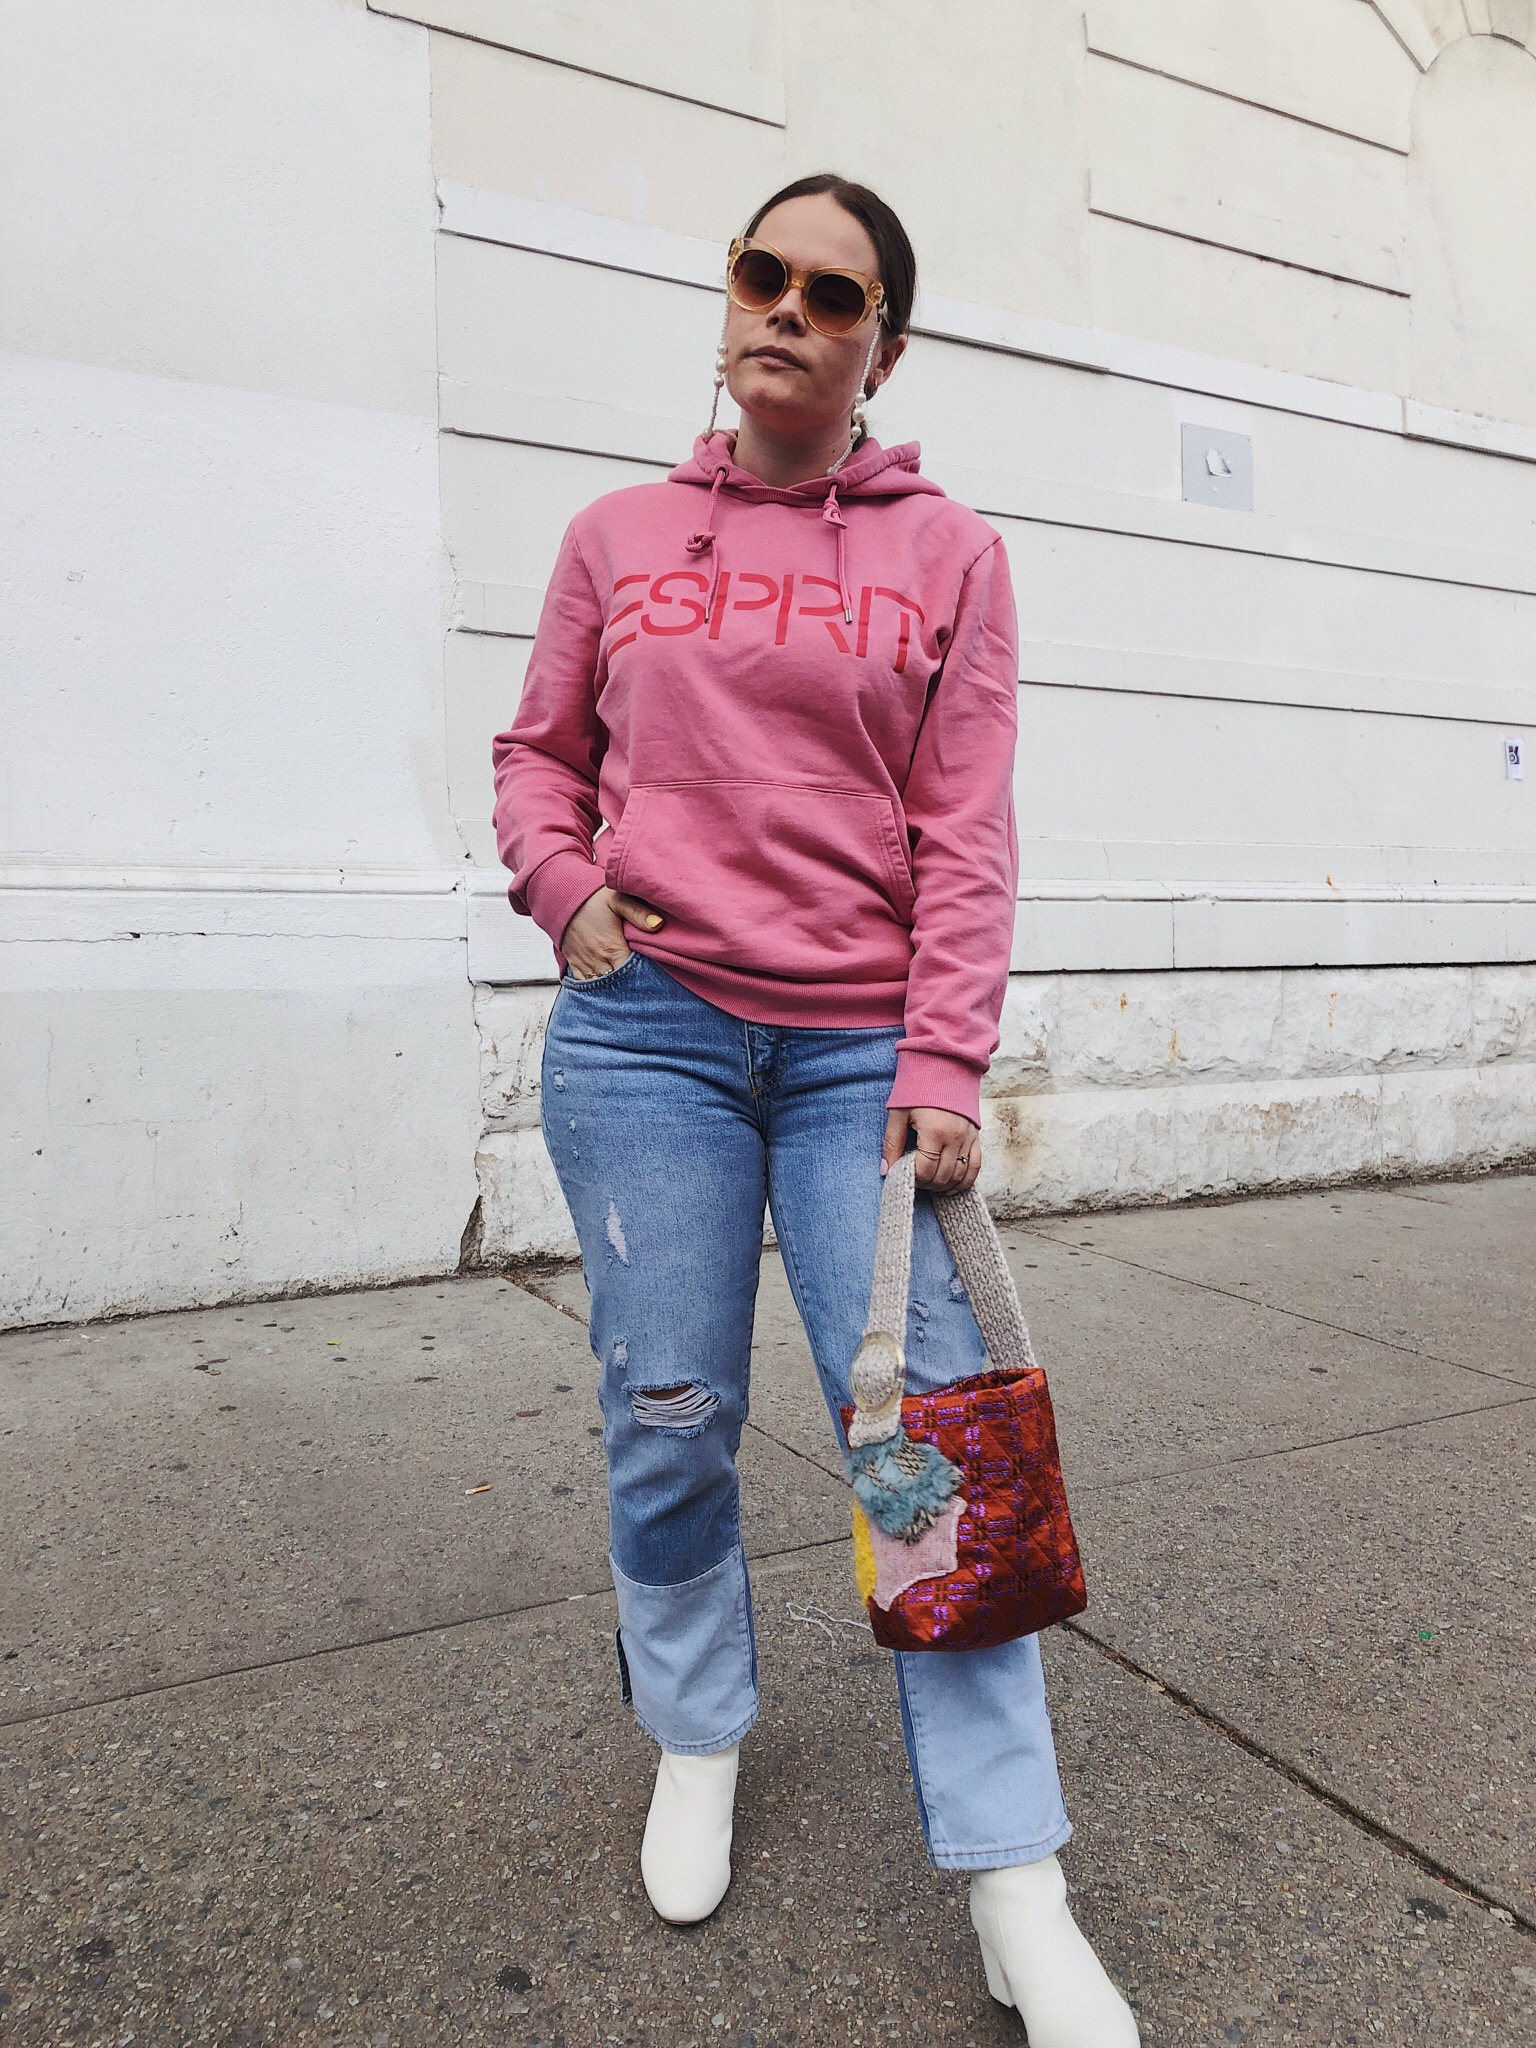 Sweater, sunglasses, & bag bought at a closet sale